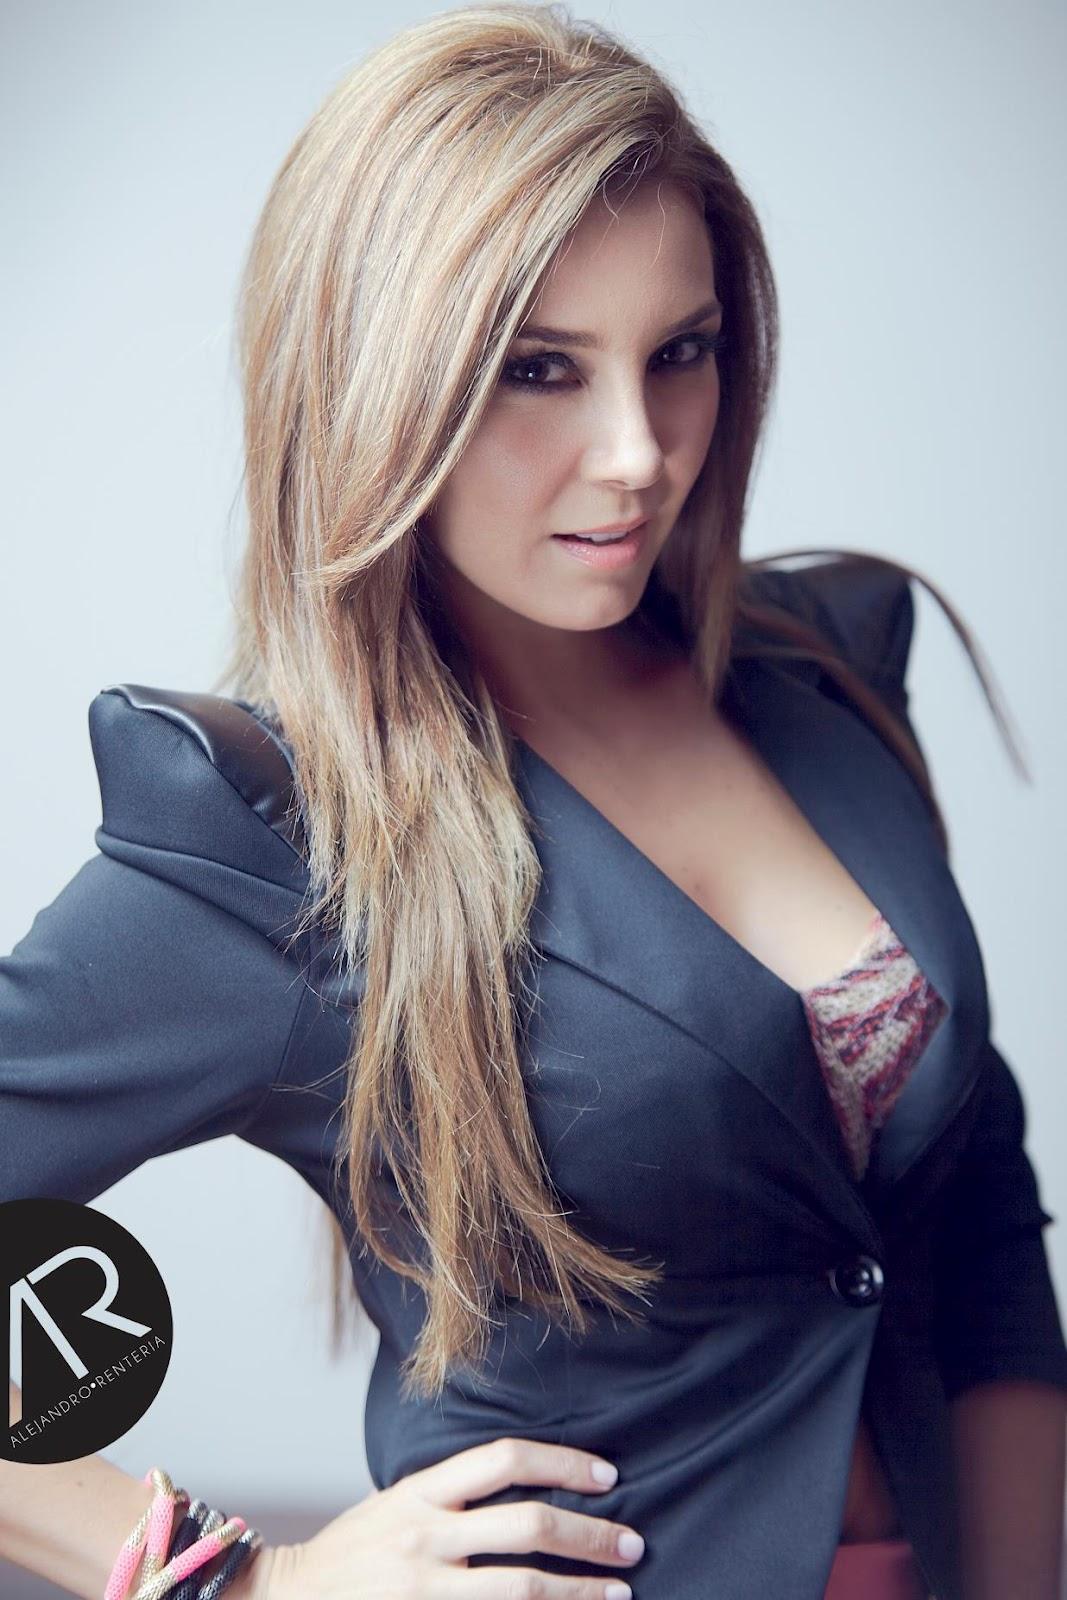 elizabeth gutierrez - photo #19